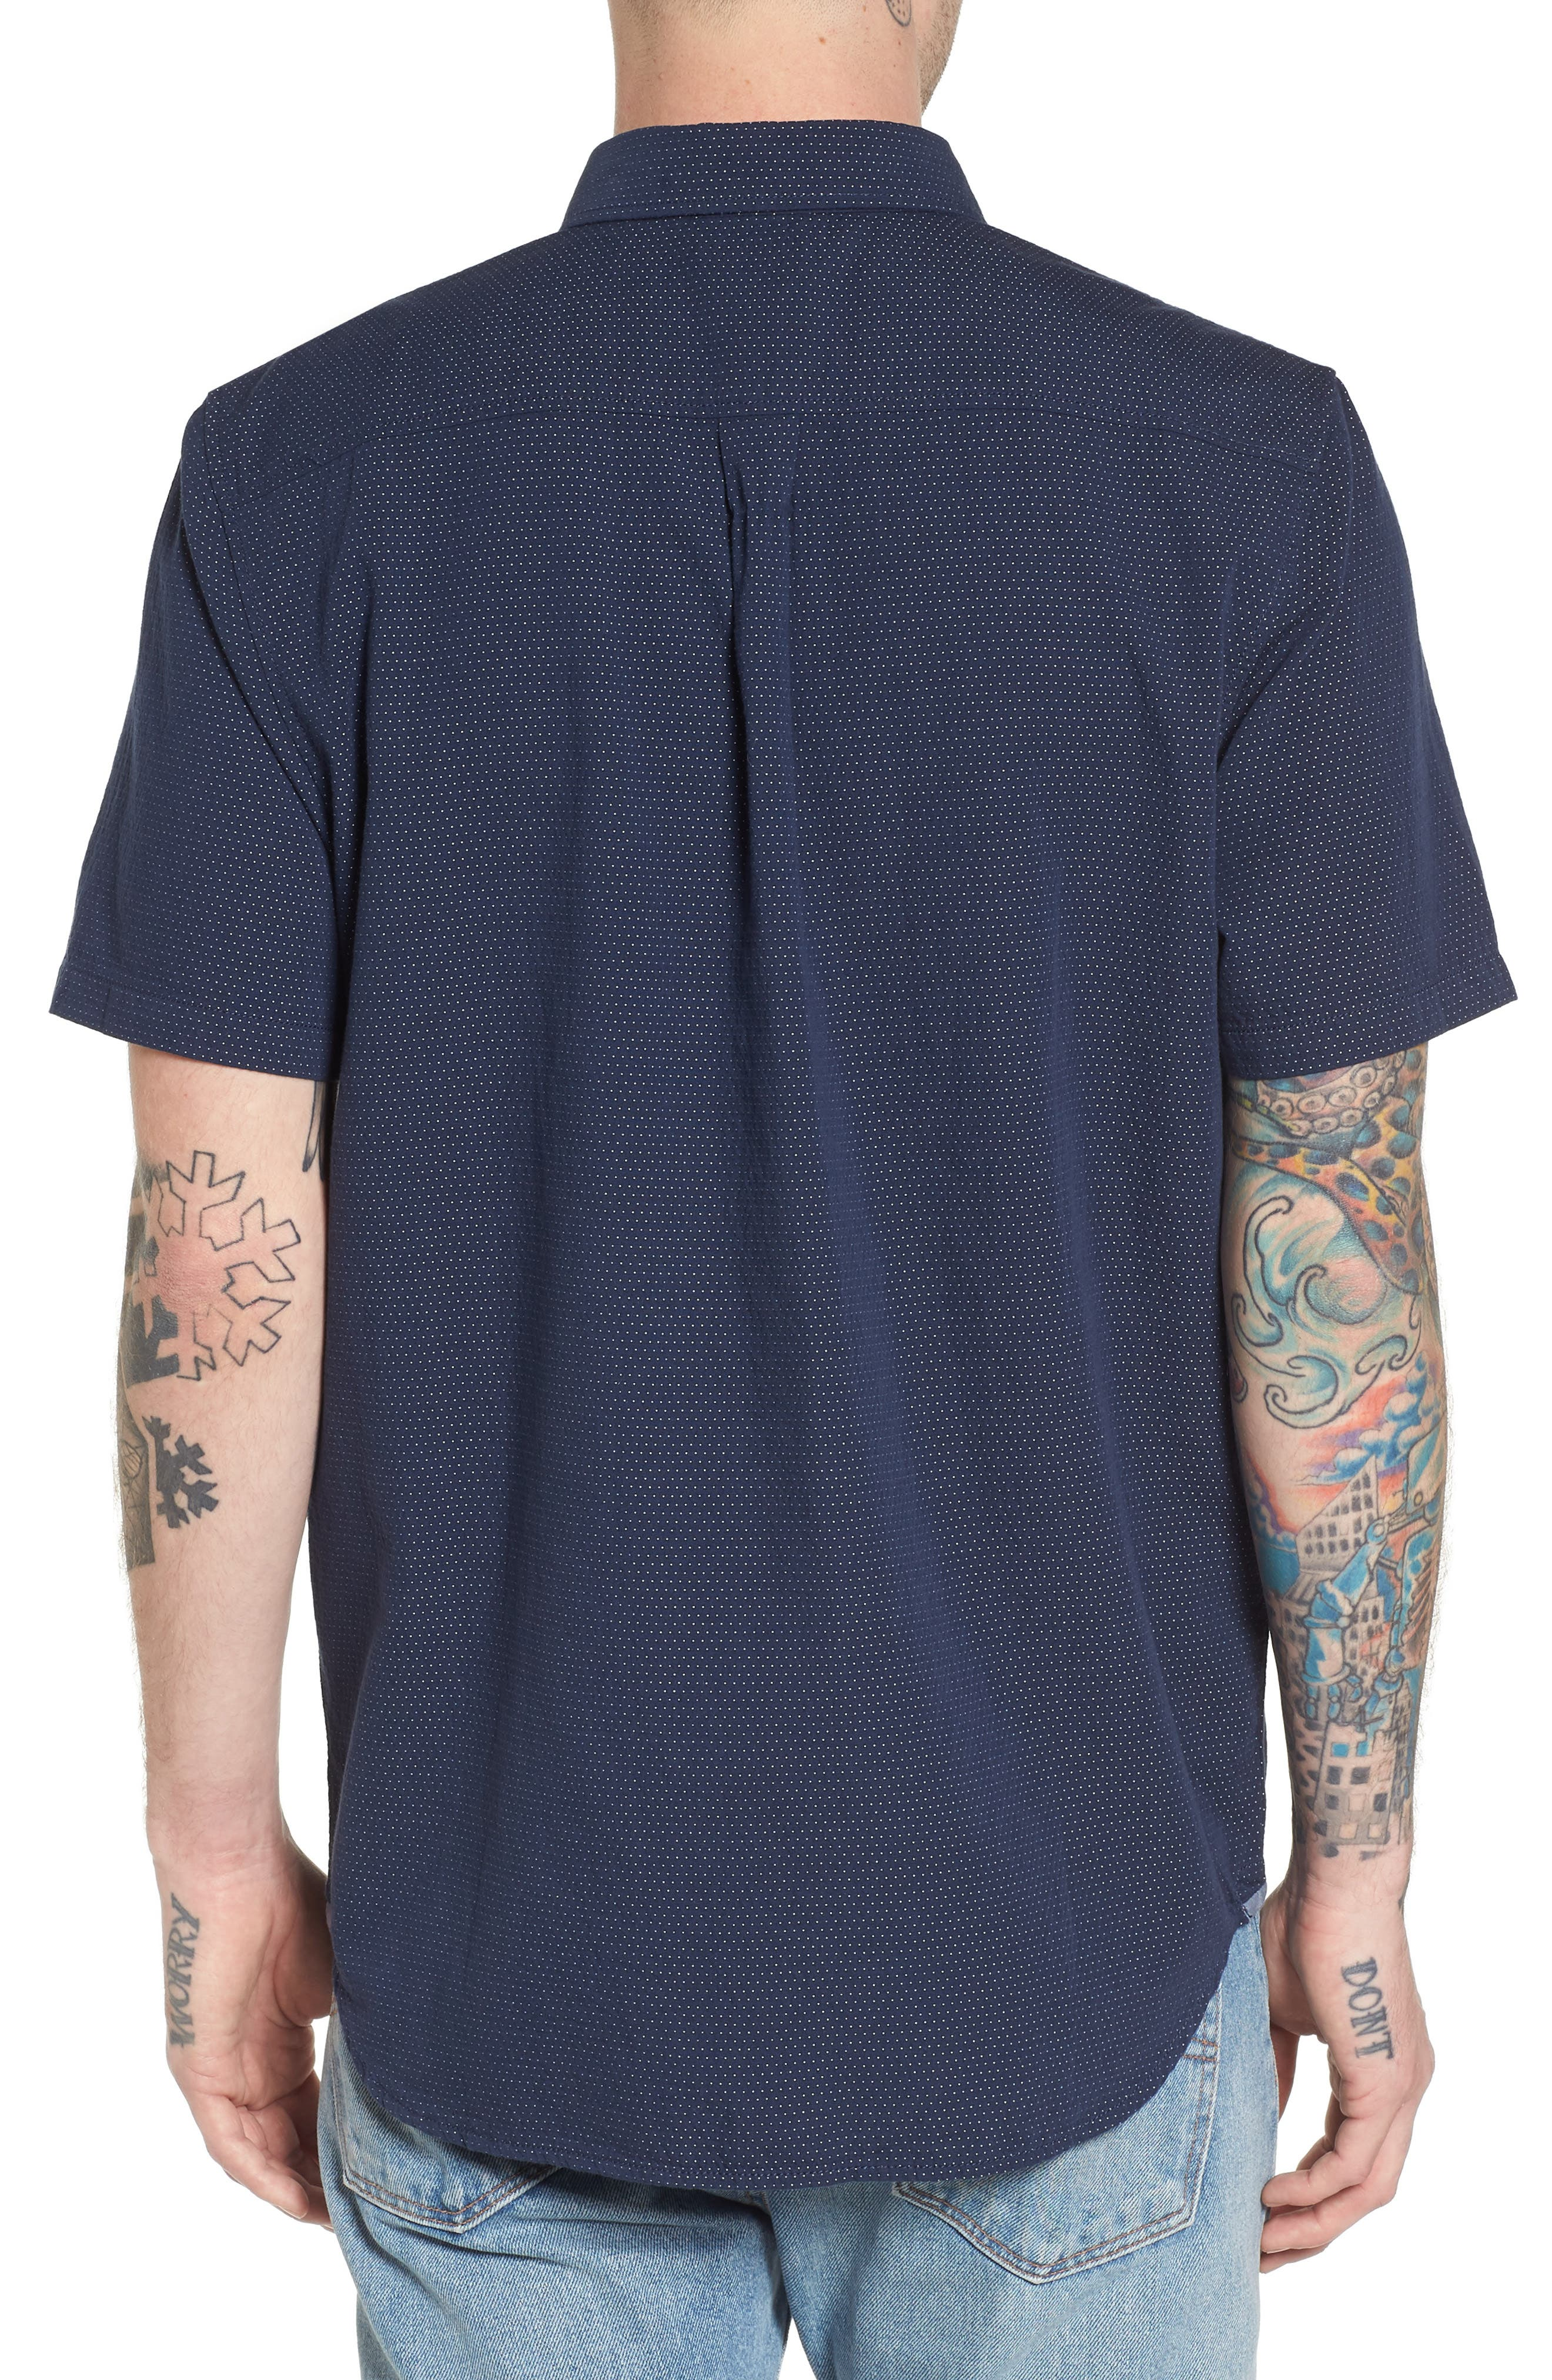 Giddings Short Sleeve Shirt,                             Alternate thumbnail 2, color,                             Dress Blues